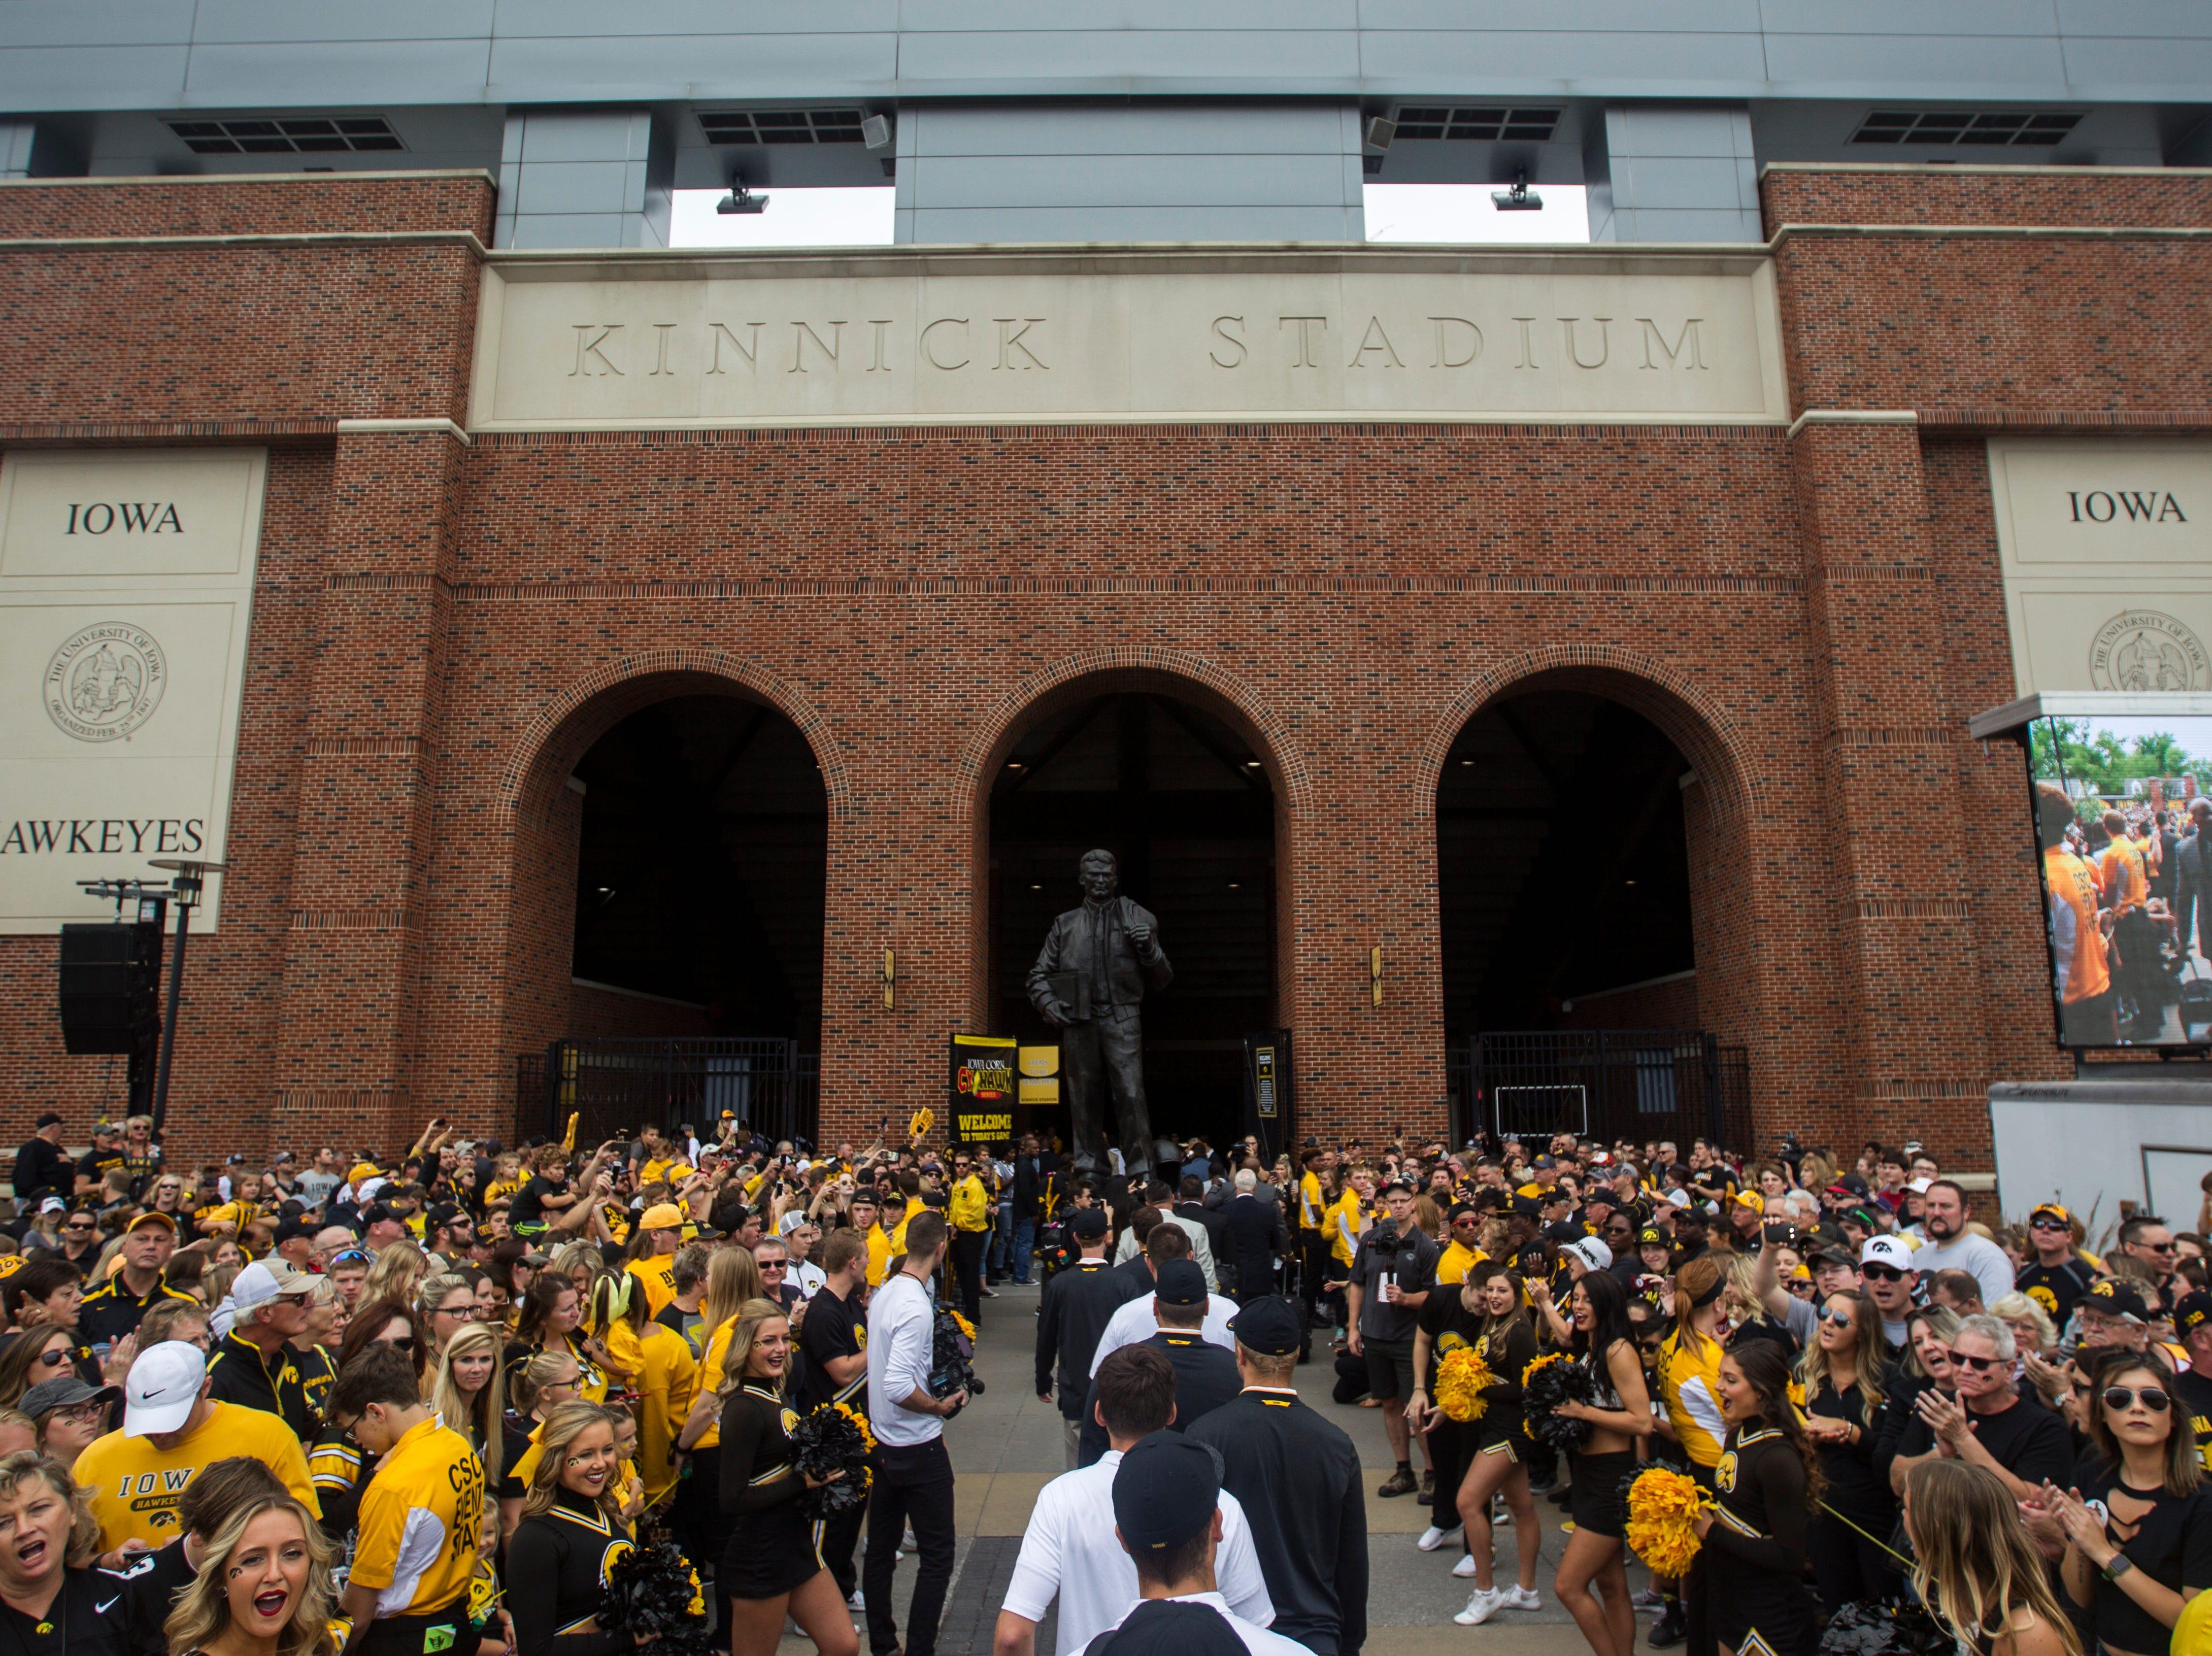 Iowa Hawkeye arrive at the stadium before the Cy-Hawk NCAA football game on Saturday, Sept. 8, 2018, at Kinnick Stadium in Iowa City.